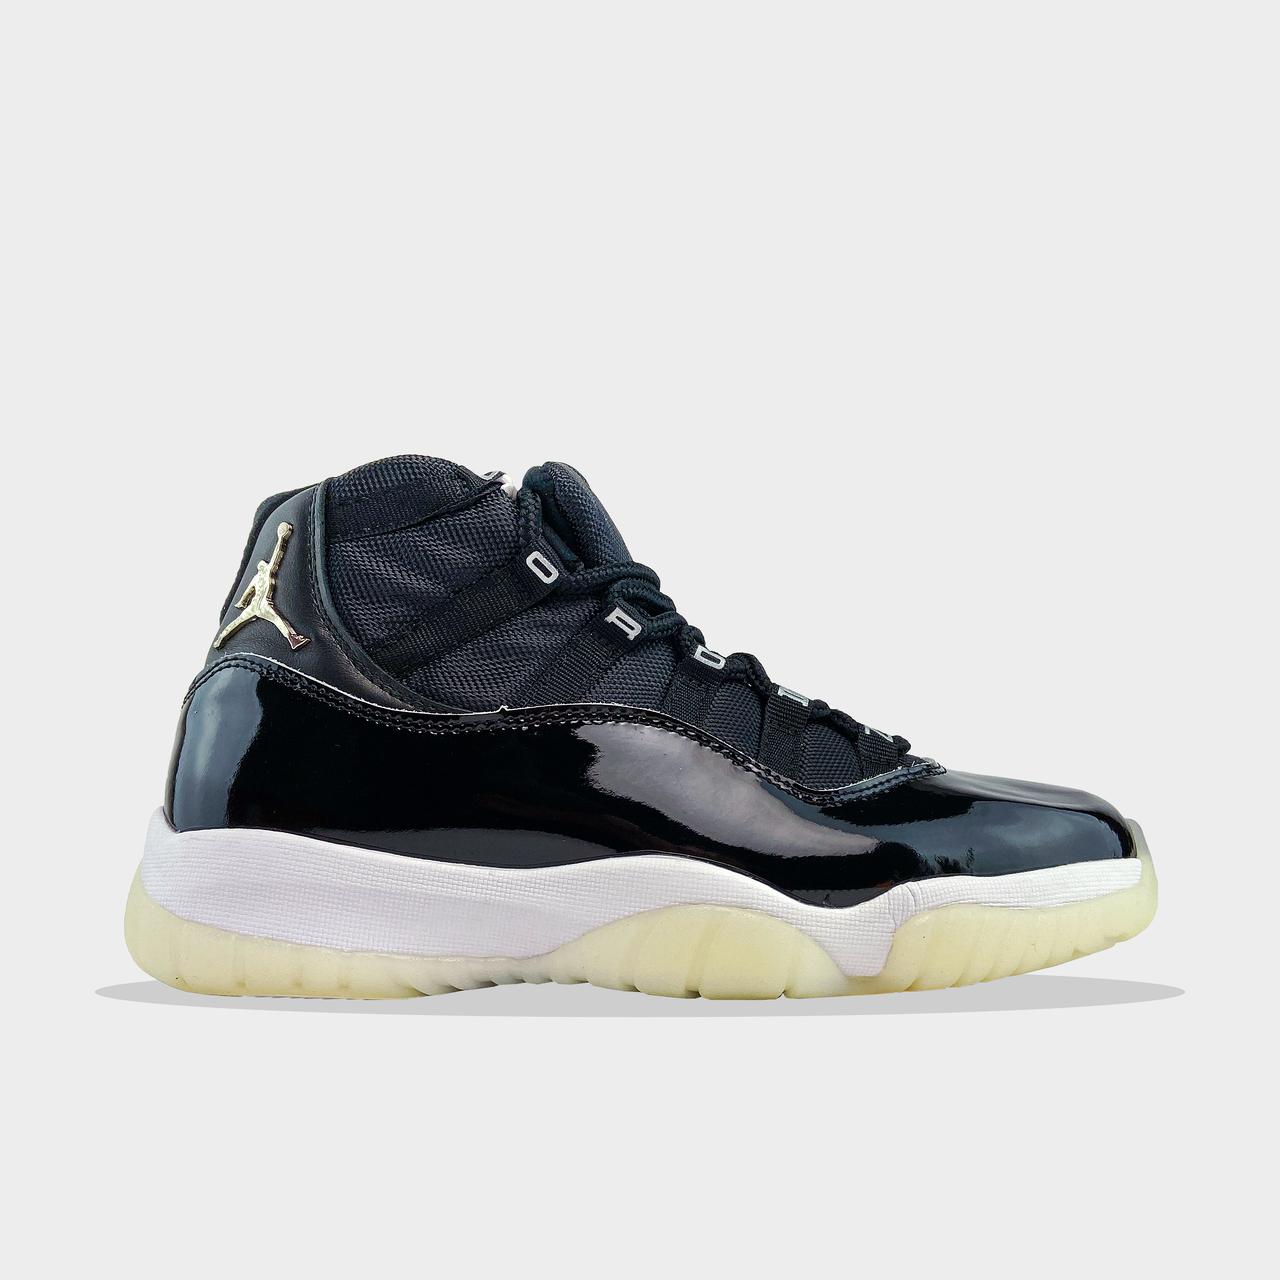 Nike Air Jordan 11 High 25th Anniversary (Черный)